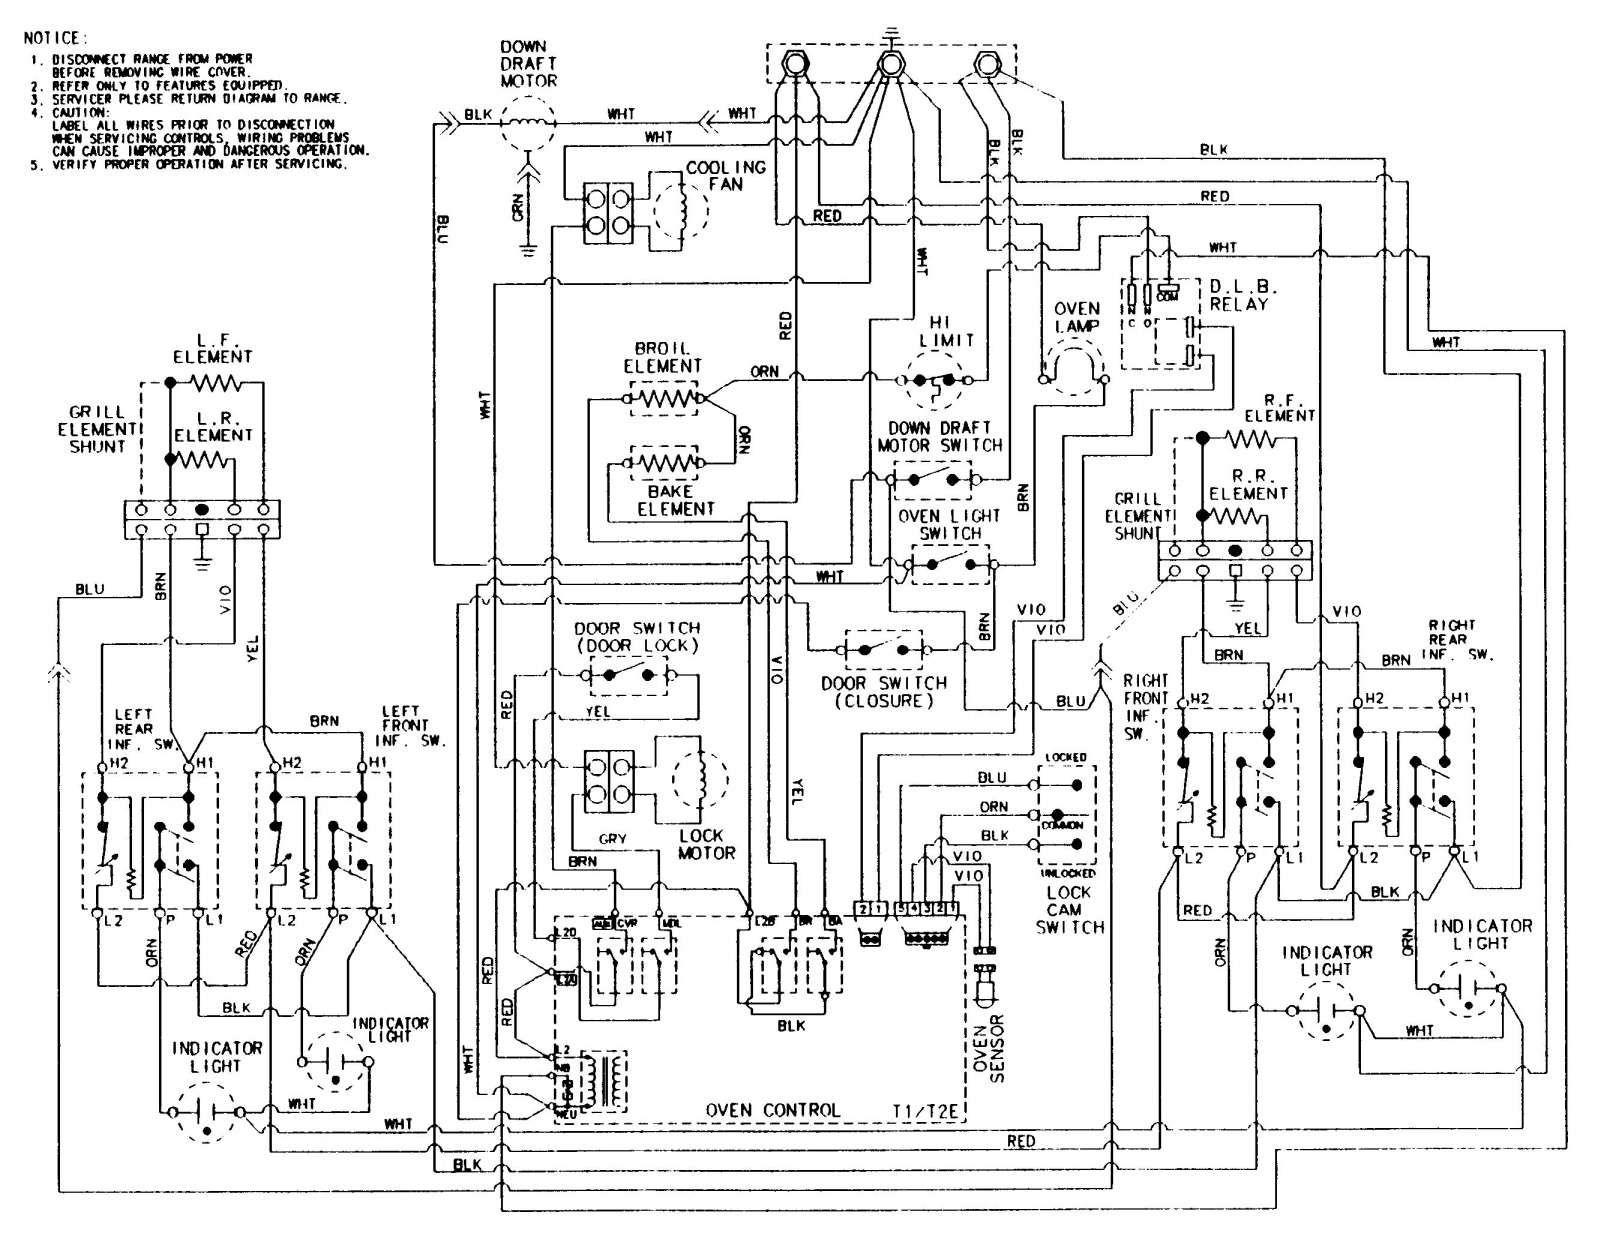 17+ Frigidaire Electric Range Wiring Diagram - Wiring Diagram - Wiringg.net  in 2020   Electrical circuit diagram, House wiring, Electrical diagramPinterest